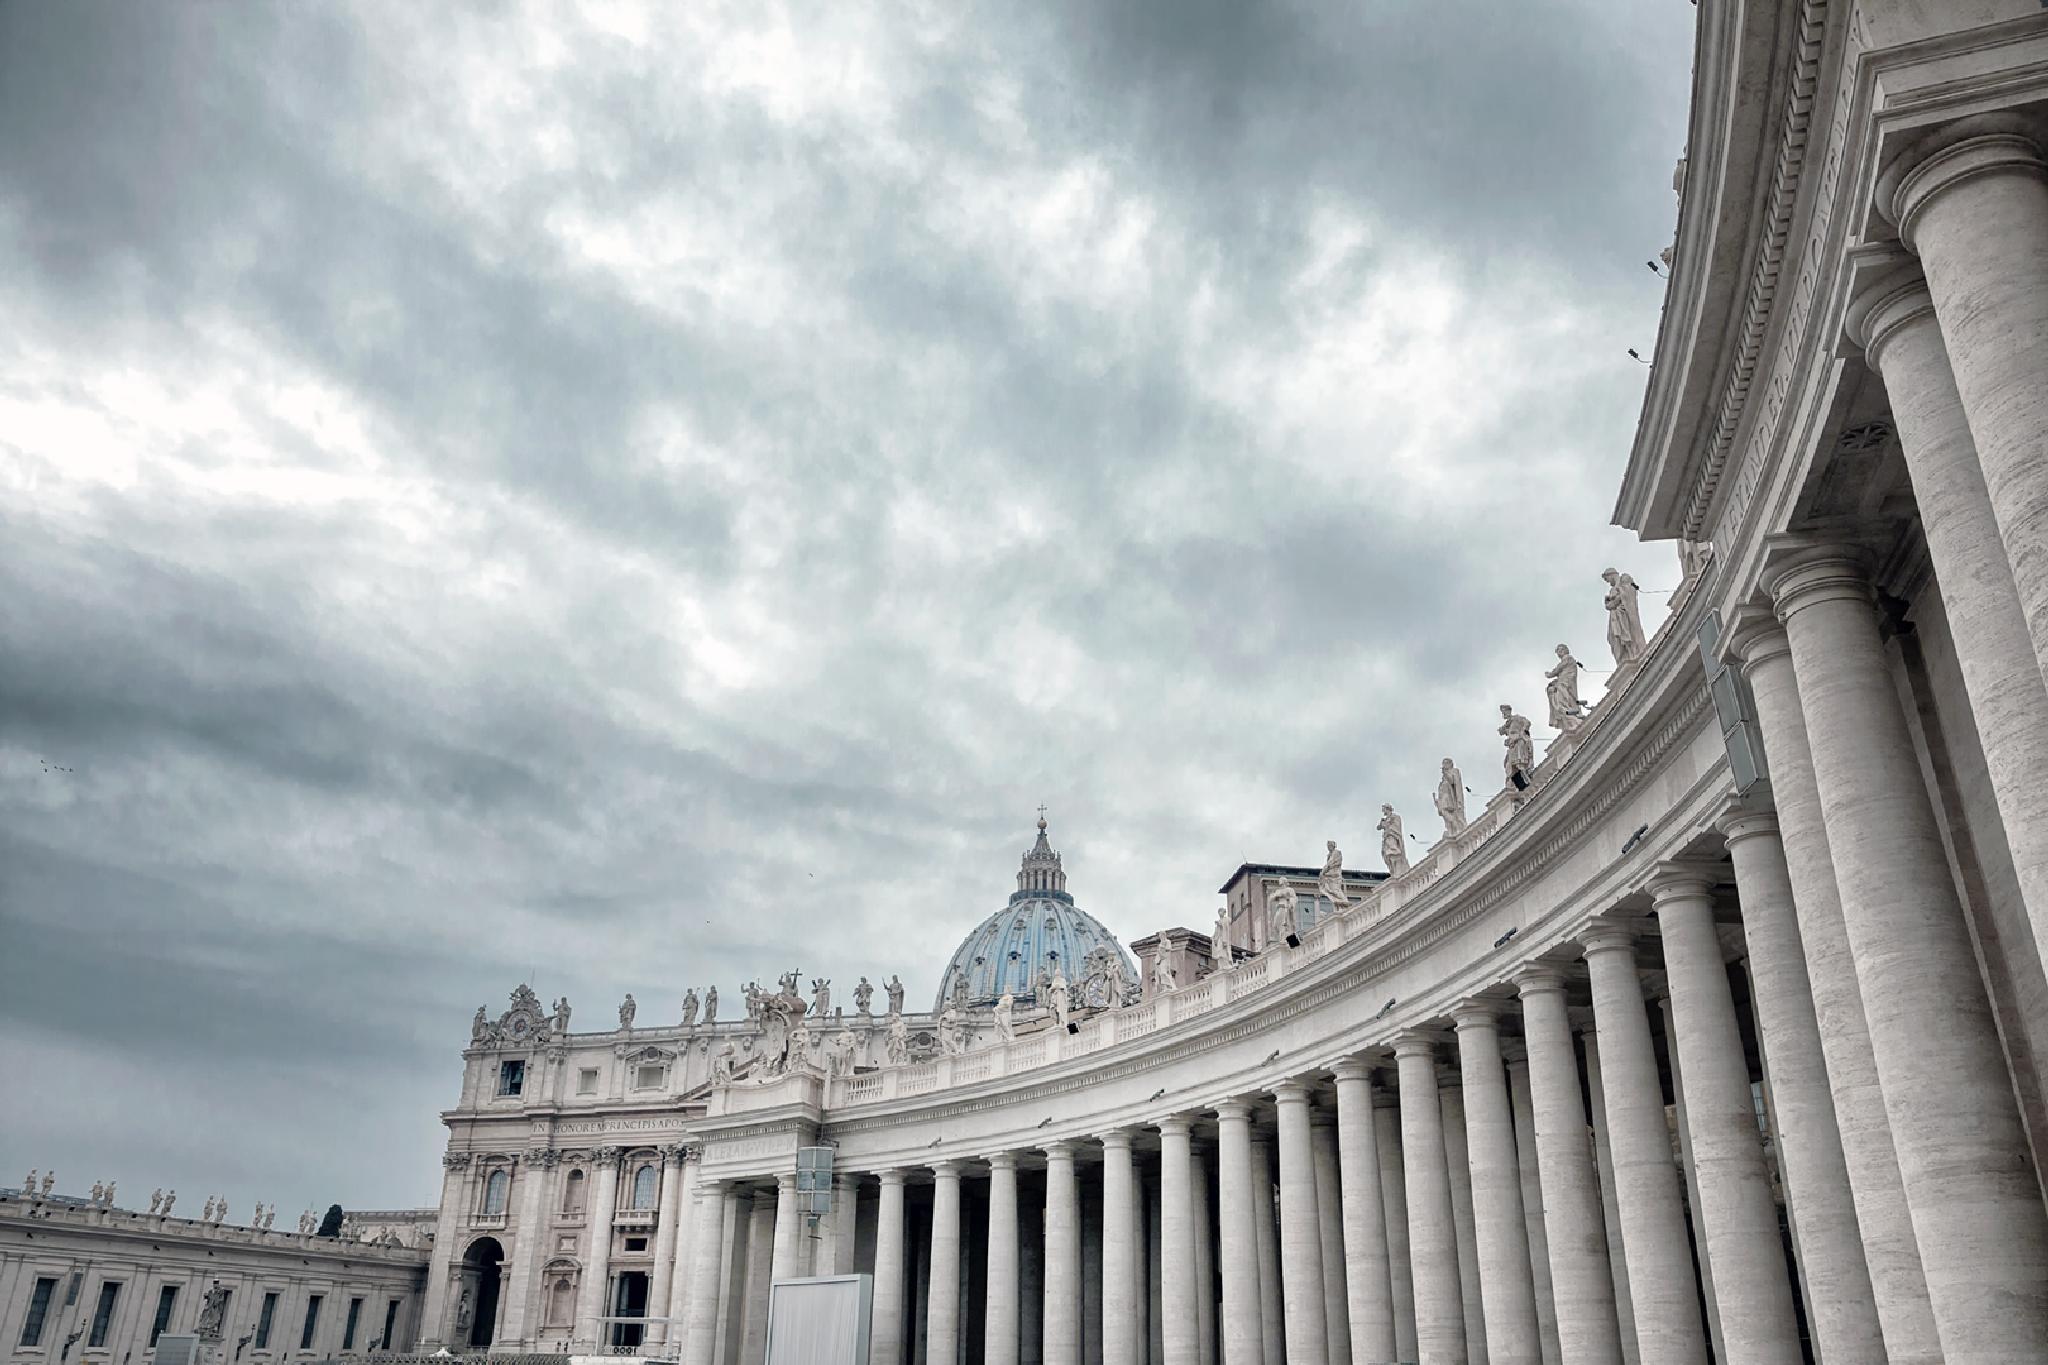 Vatican - St. Peter's Square colonnades (Vatikan) by Ozan Tüzün